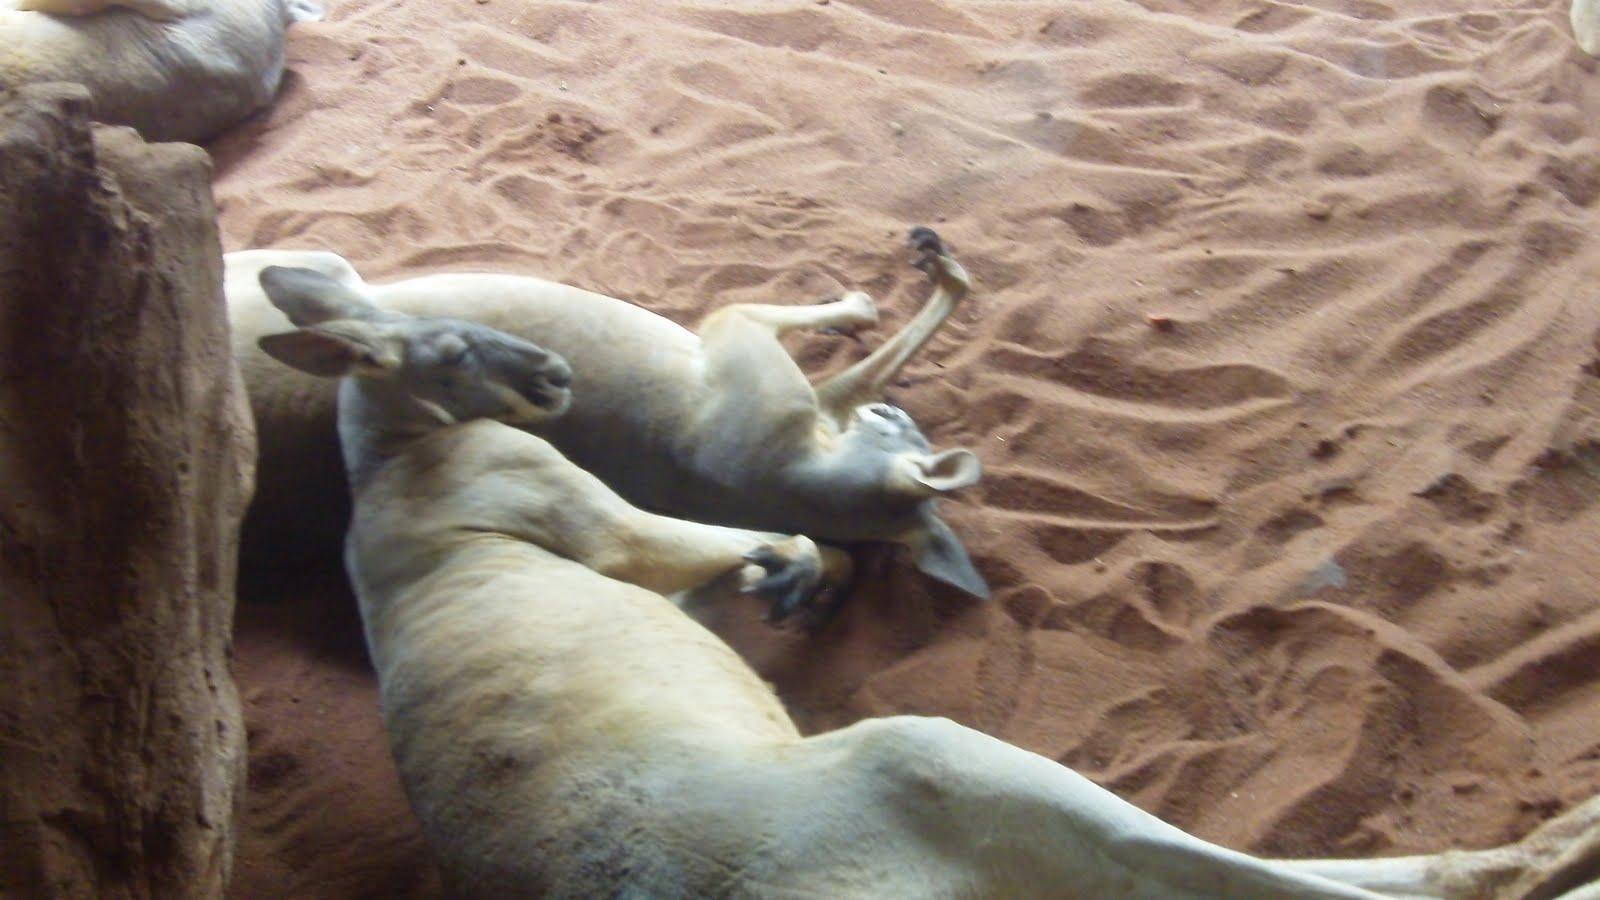 Cassowary attack victim - photo#8